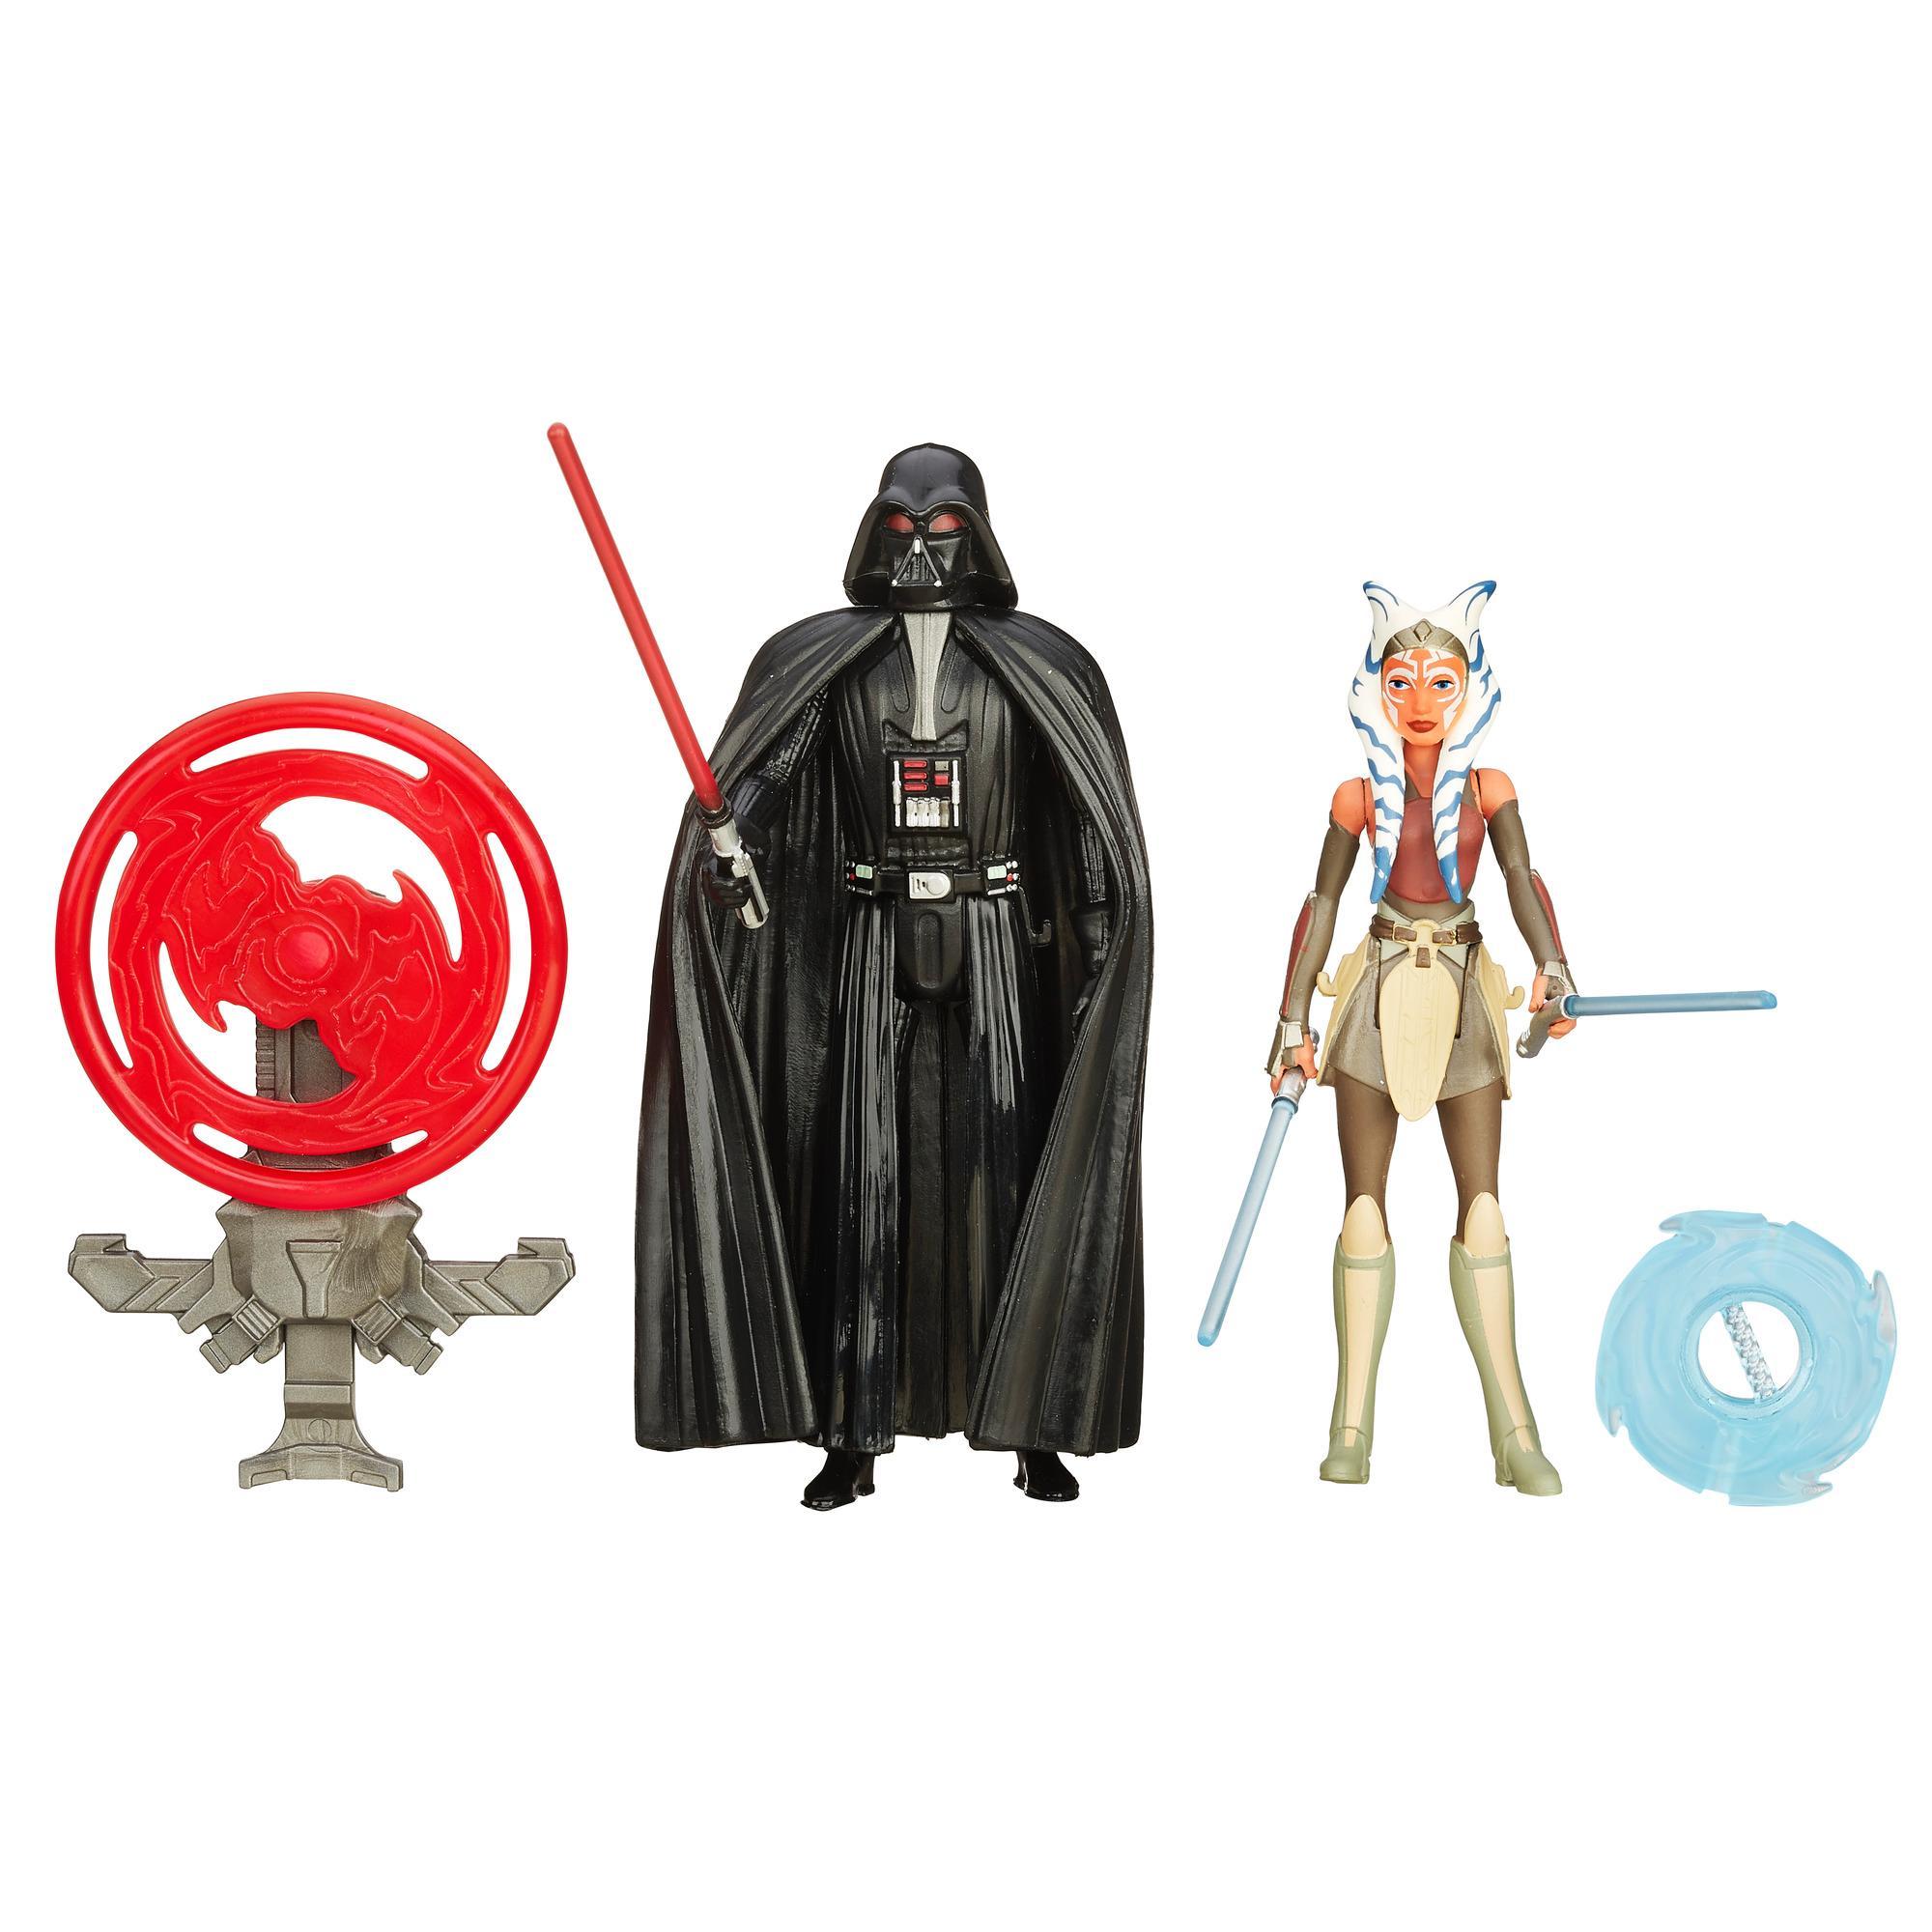 Star Wars Rebels - Kit Missão Espacial com 2 Figuras de 9,5 cm: Darth Vader e Ahsoka Tan